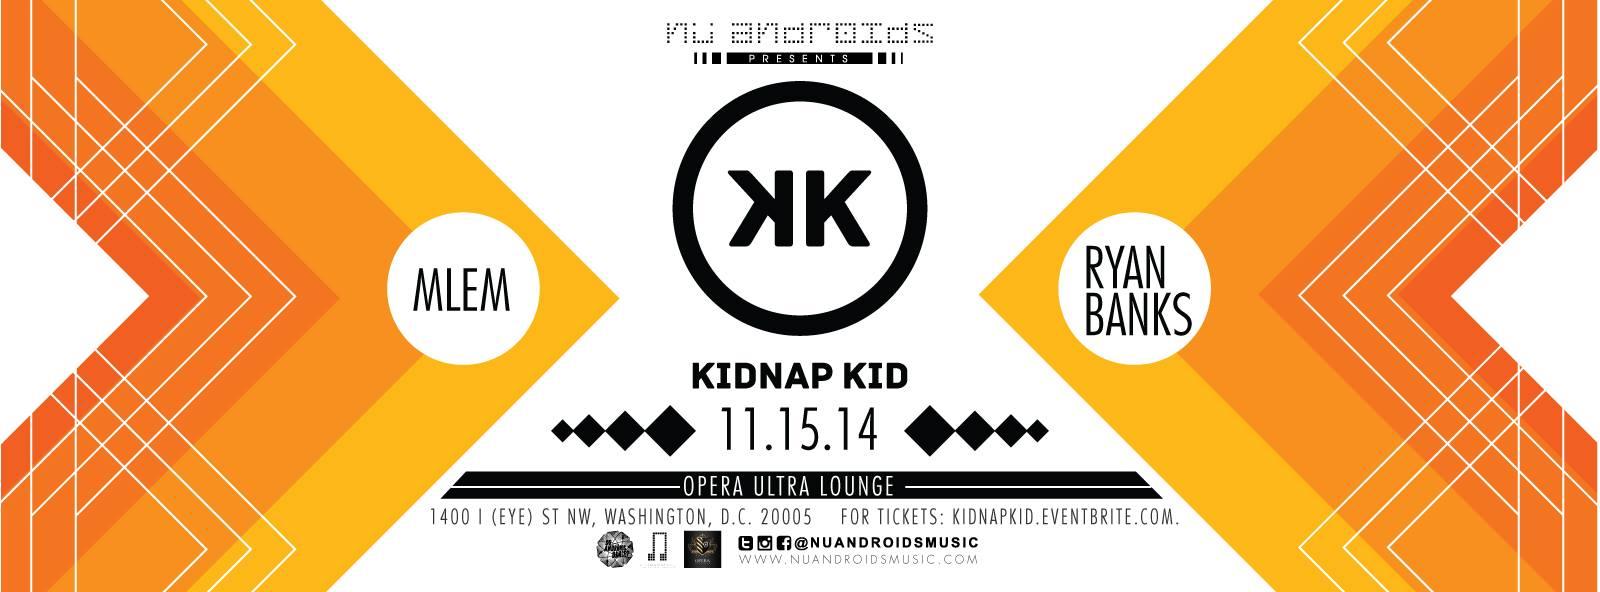 Nü Androids Present - Kidnap Kid at Opera Ultra Lounge